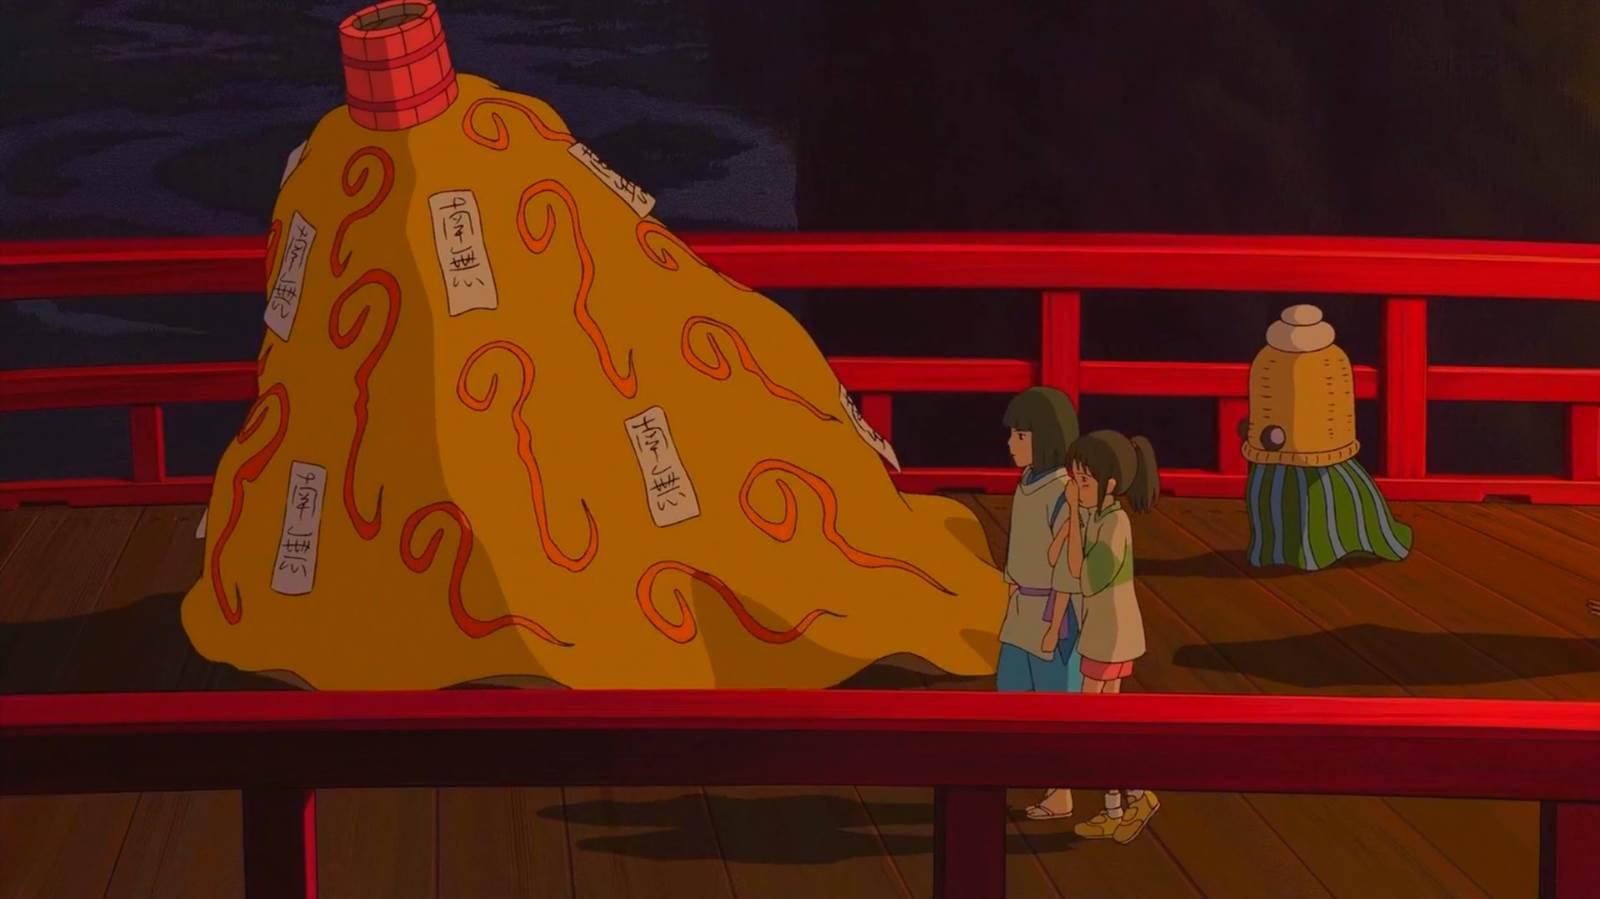 Sen to Chihiro no Kamikakushi, Holding breath